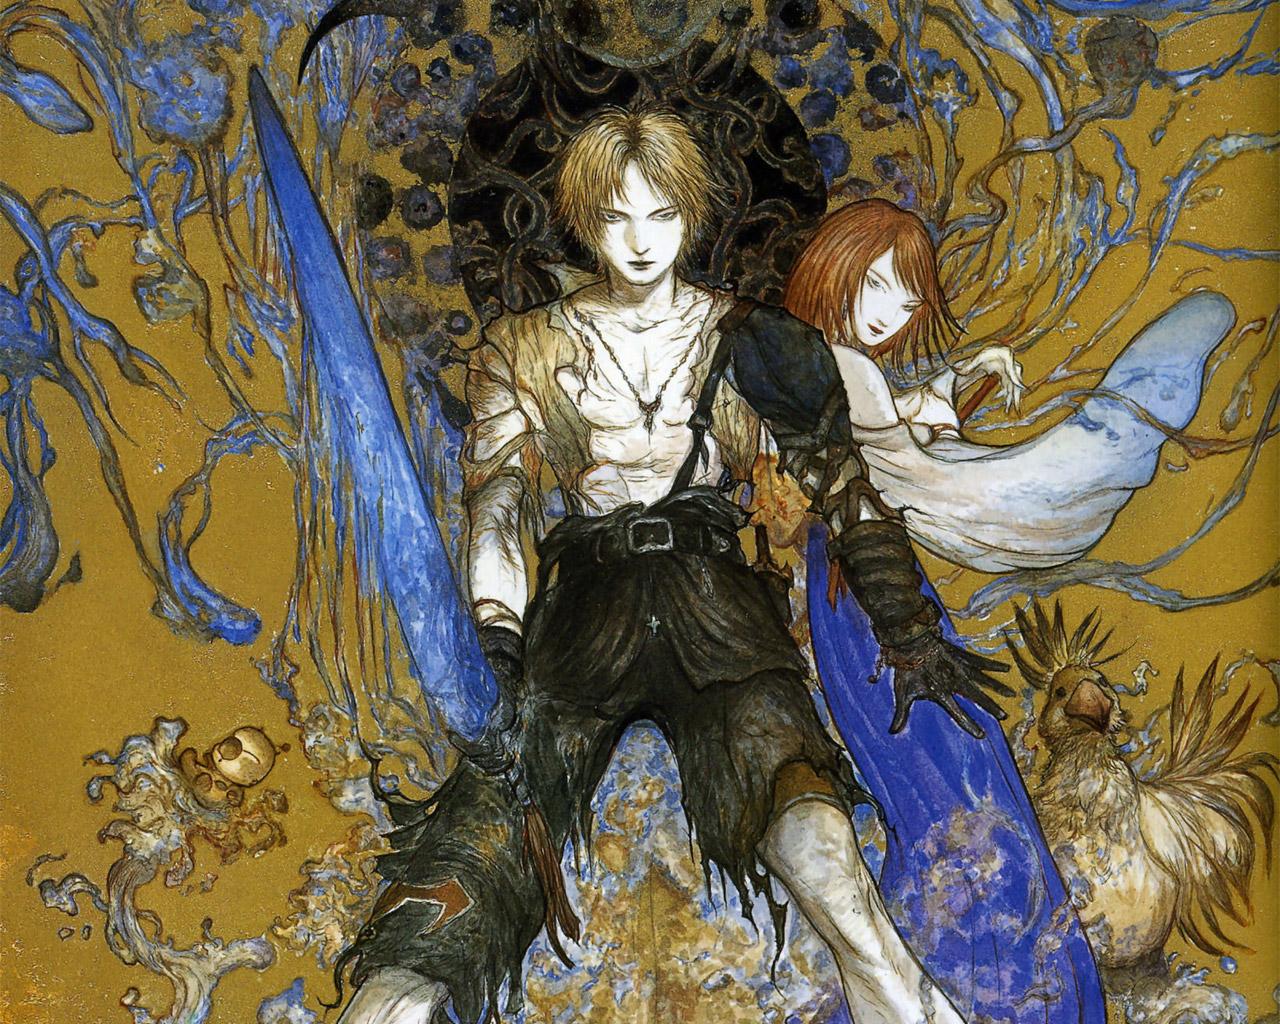 Free Final Fantasy X Wallpaper in 1280x1024